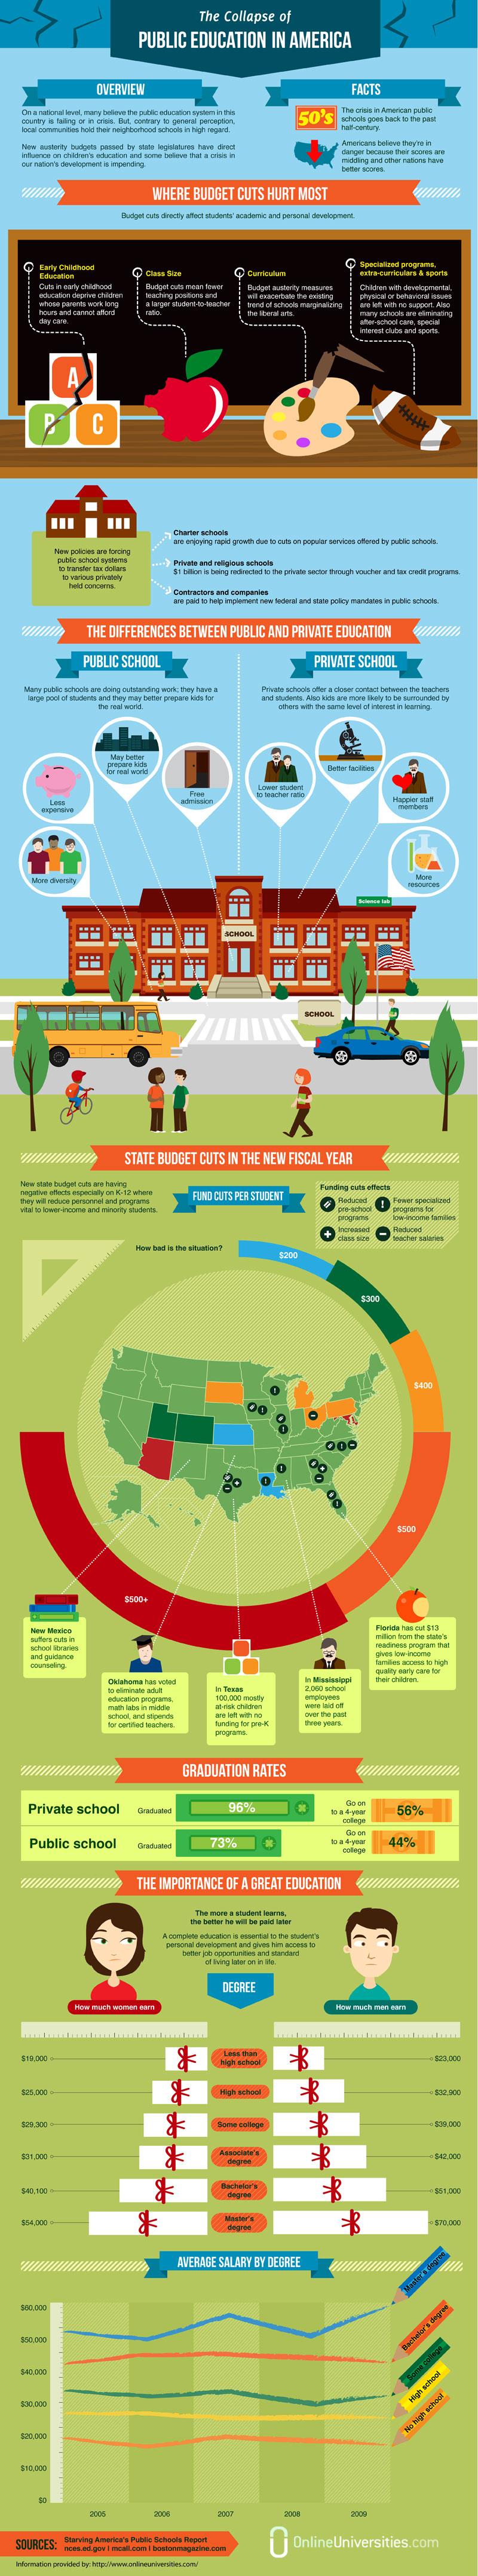 Public School Crisis in America-Infographic